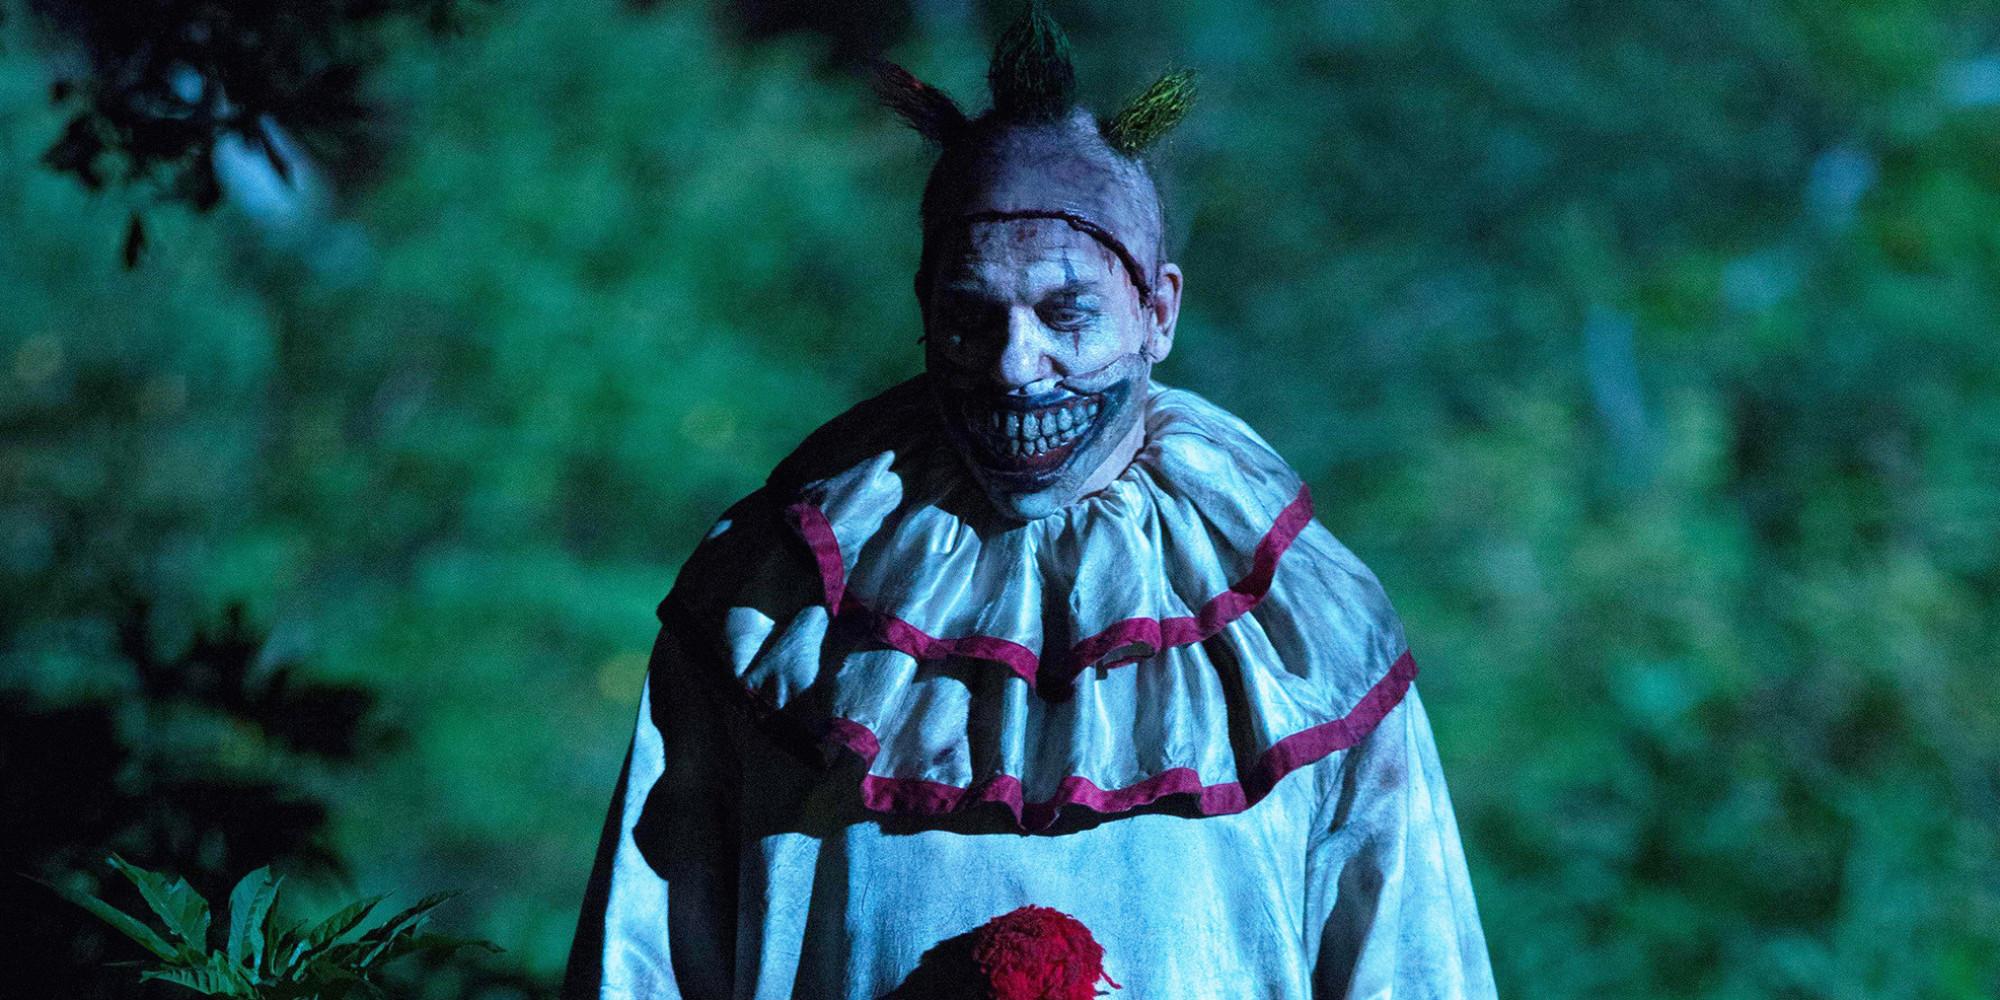 Meet The Man Behind Twisty The Clown On 'American Horror Story: Freak ...